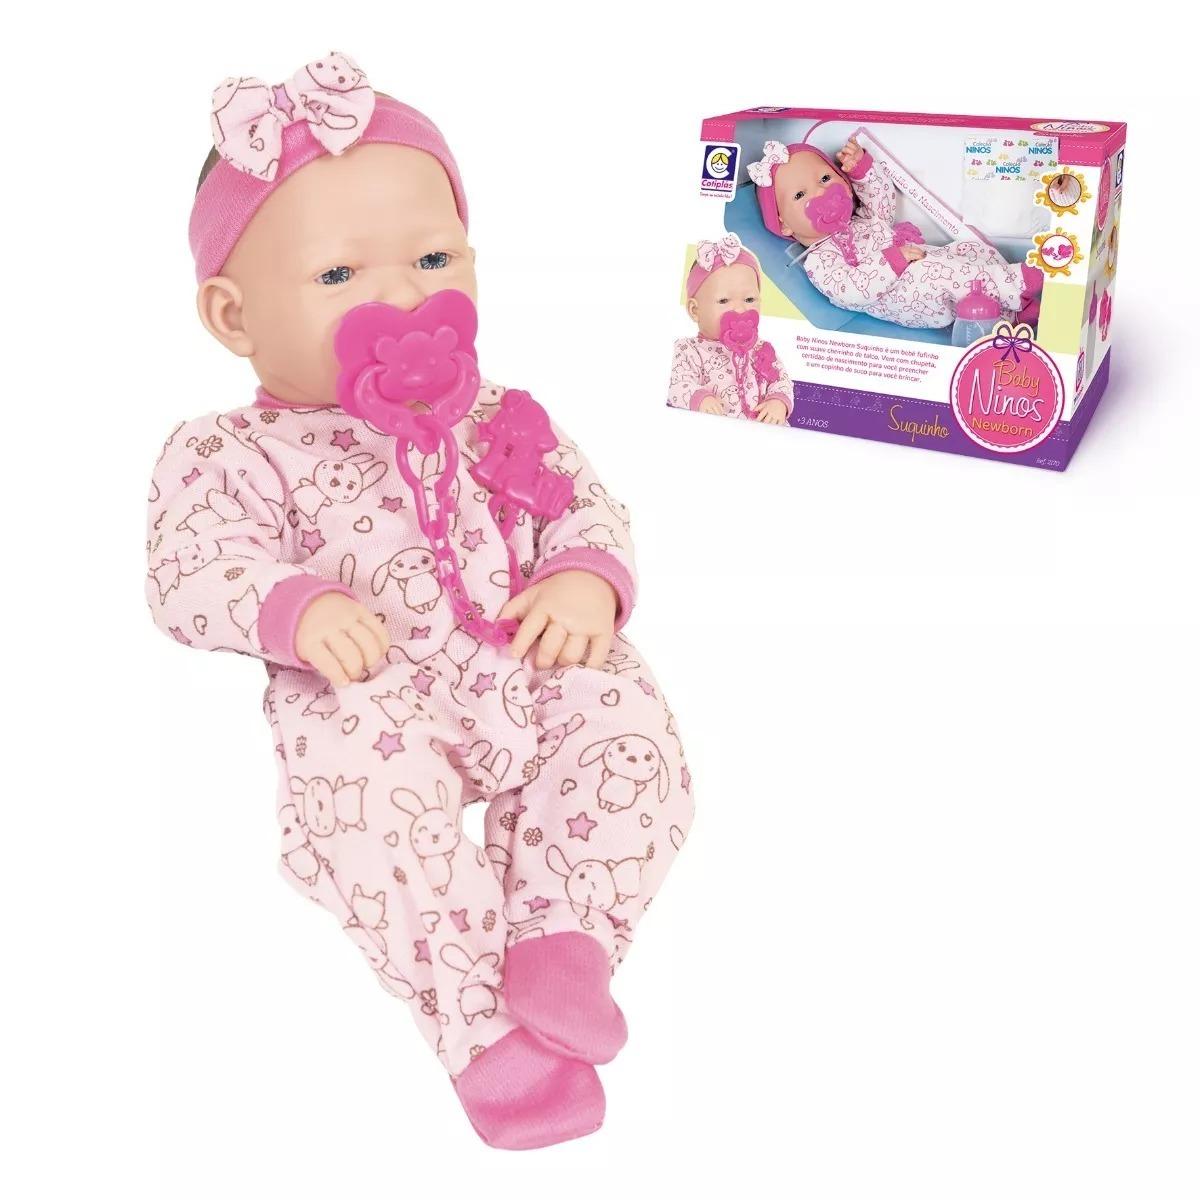 BABY NINOS NEW BORN 2170*